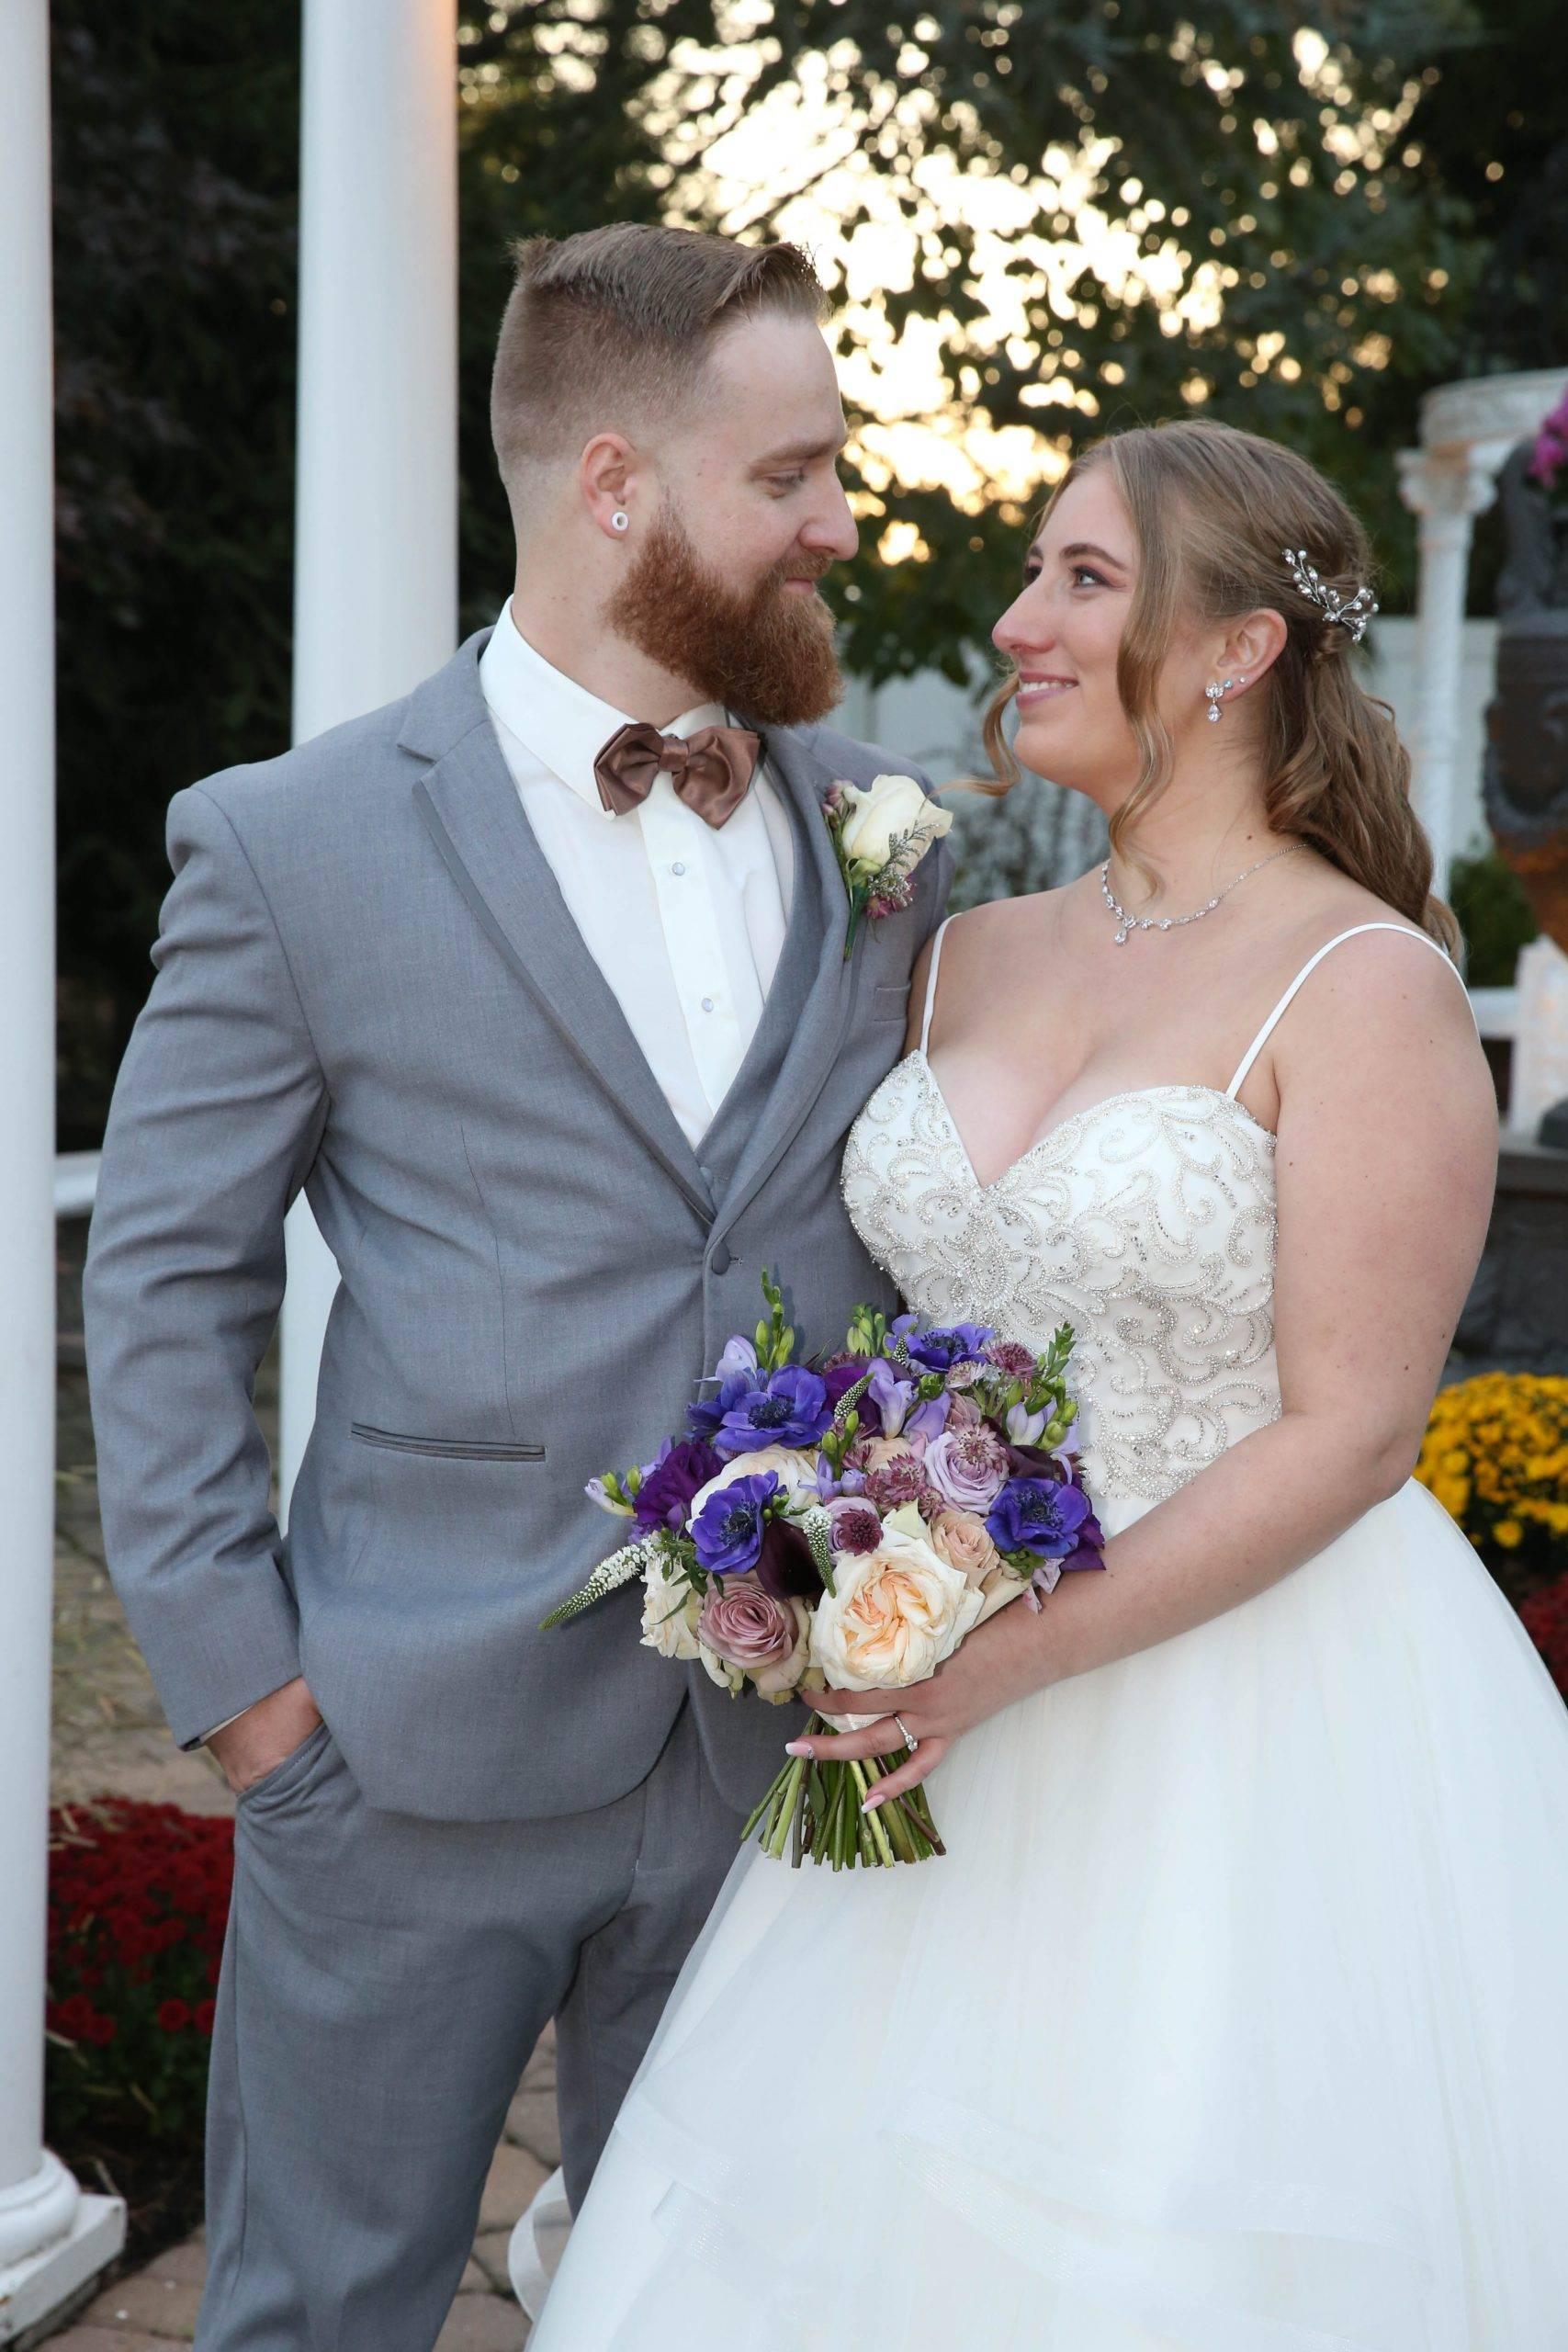 Primavera Regency bride and groom